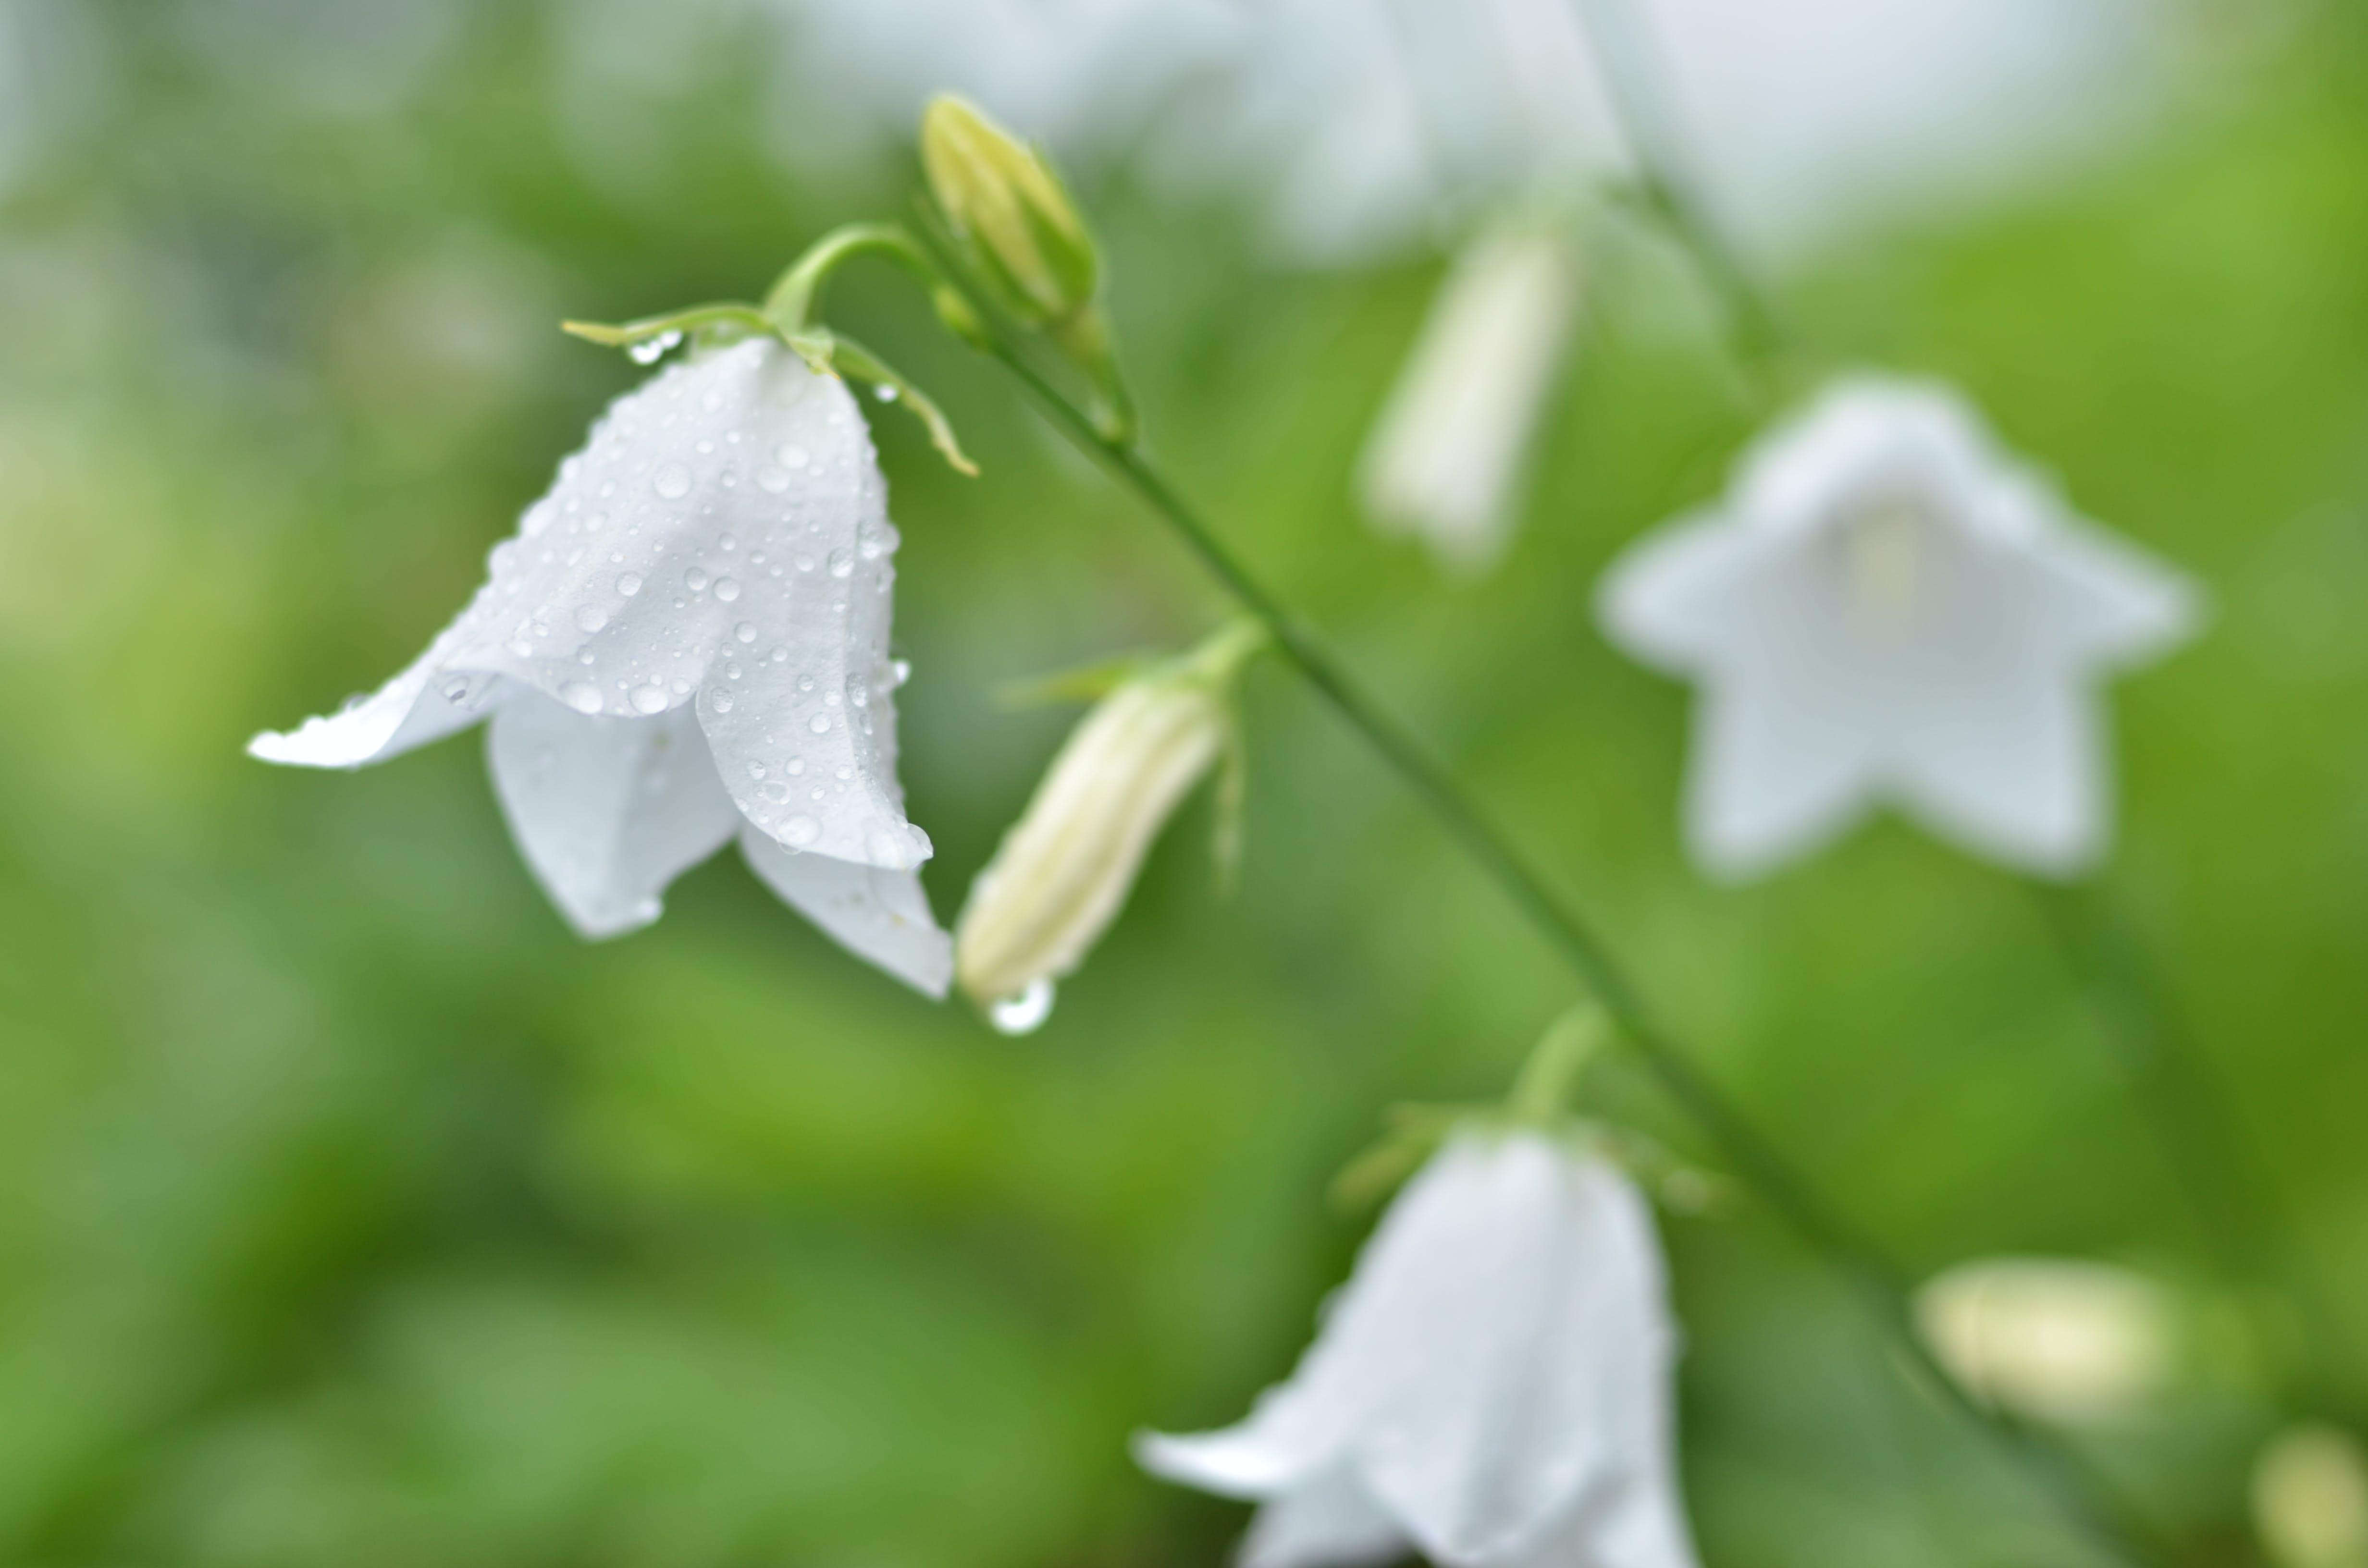 Free stock photo of bell-shaped flower, bellflower, campanula, grass